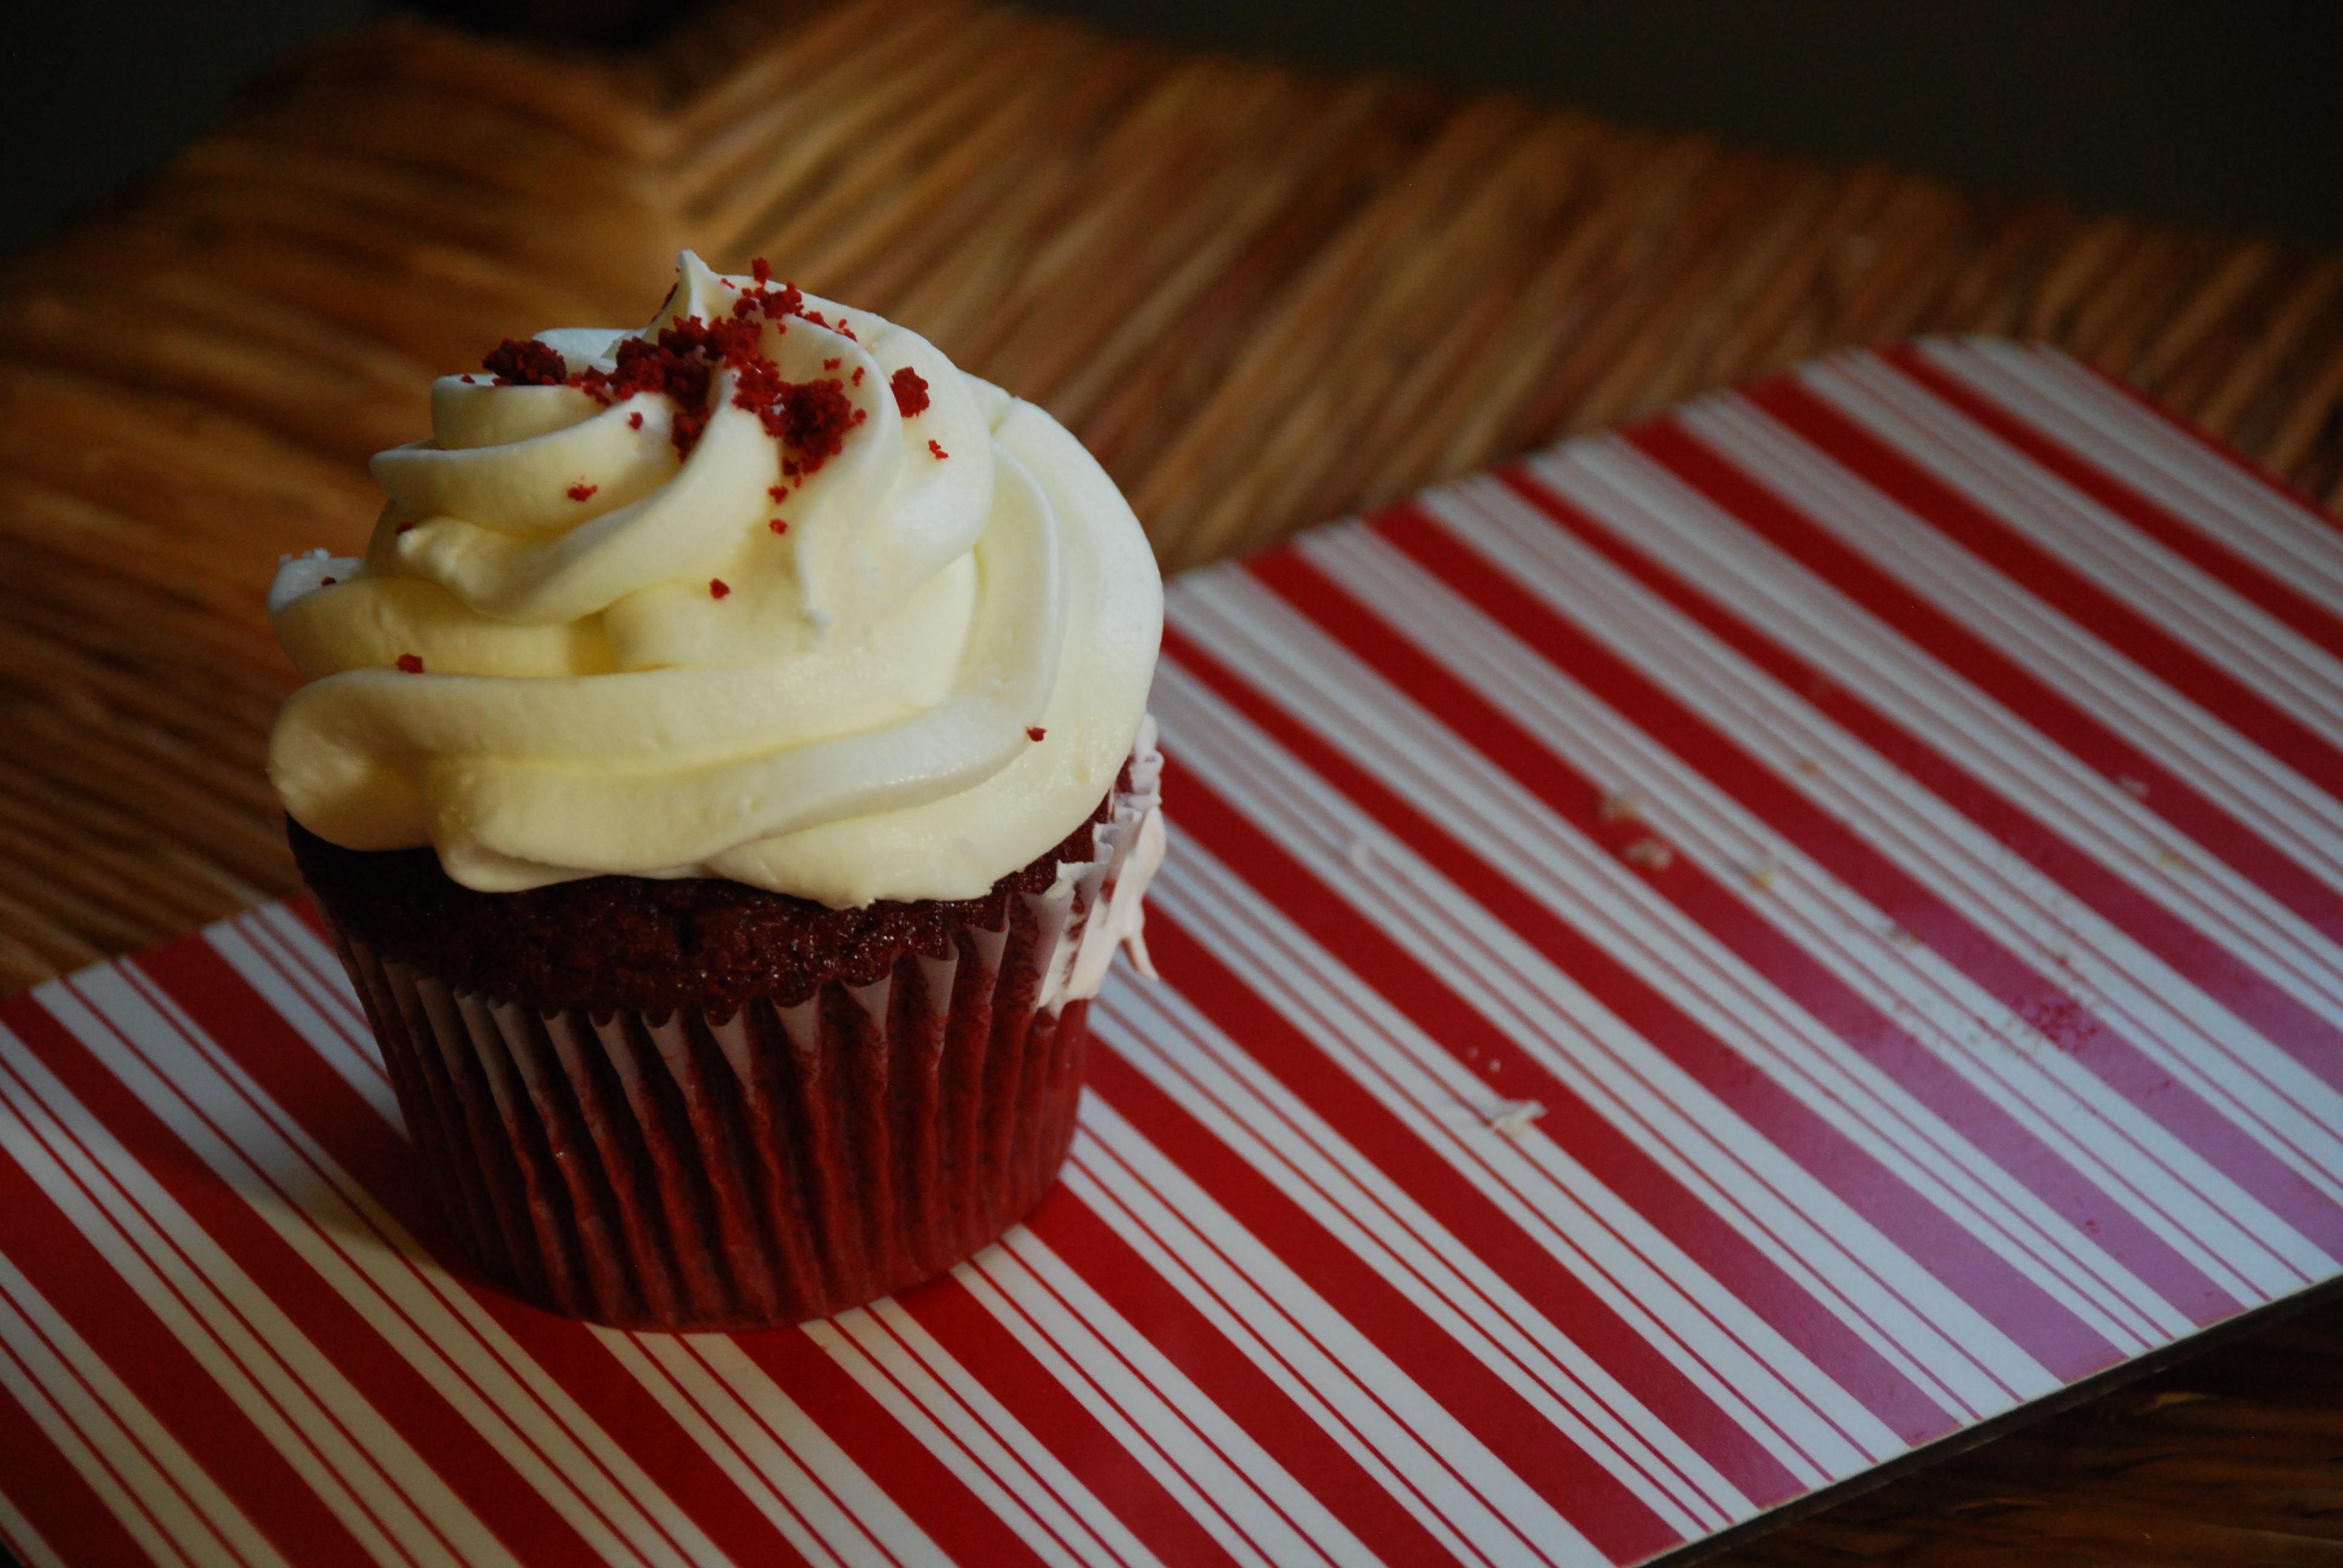 The Red Velvet cupcake from Lyndell's Bakery in Somerville.  A Somerville institution since 1887.